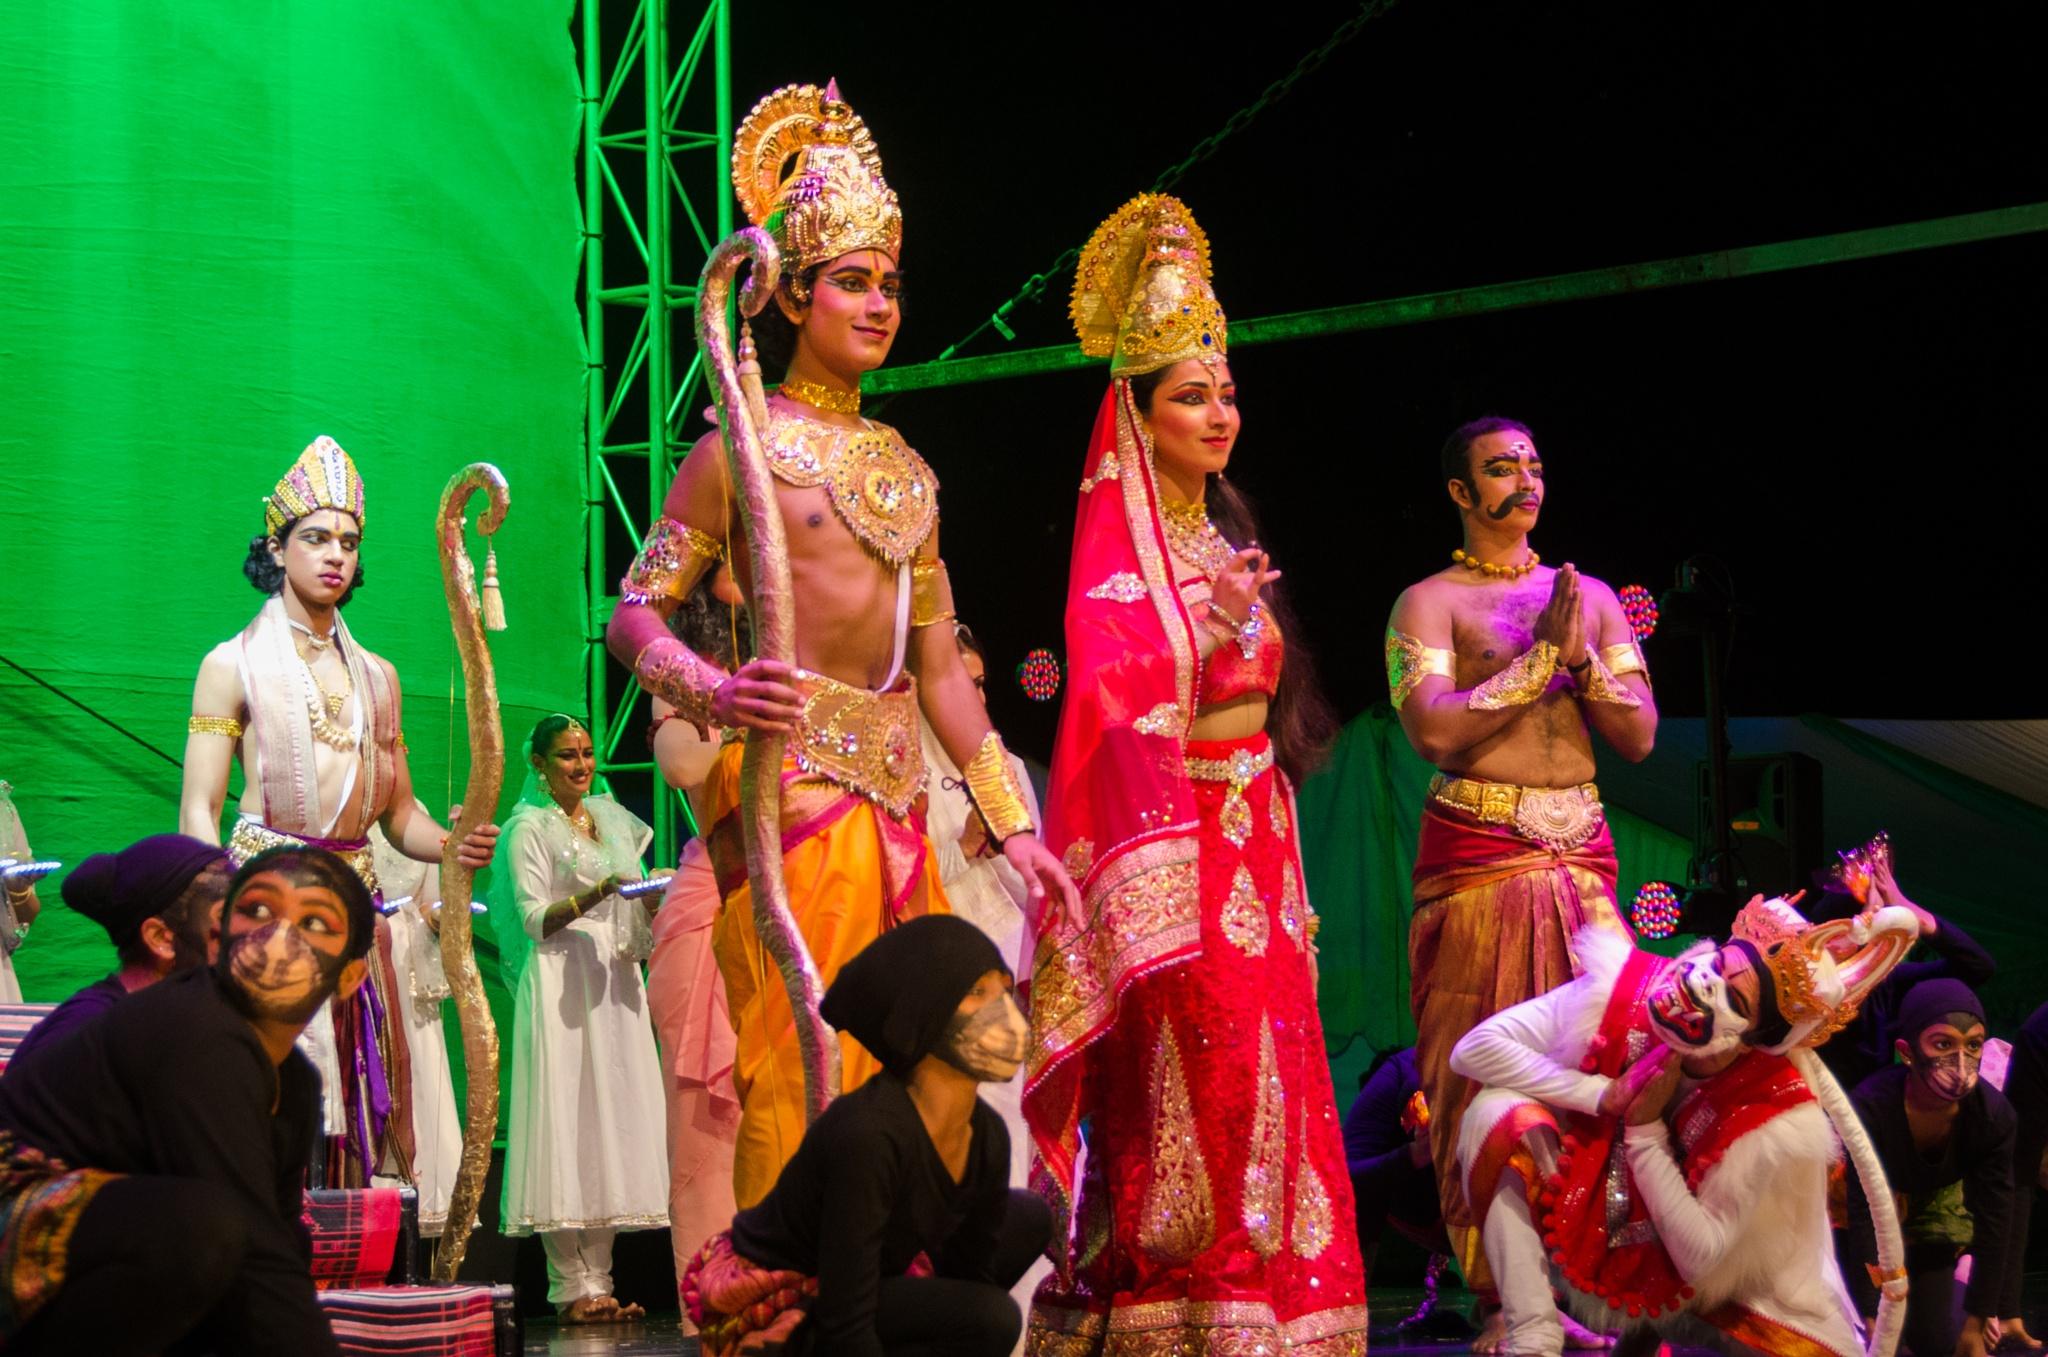 Ramayana by Atul Rastogi